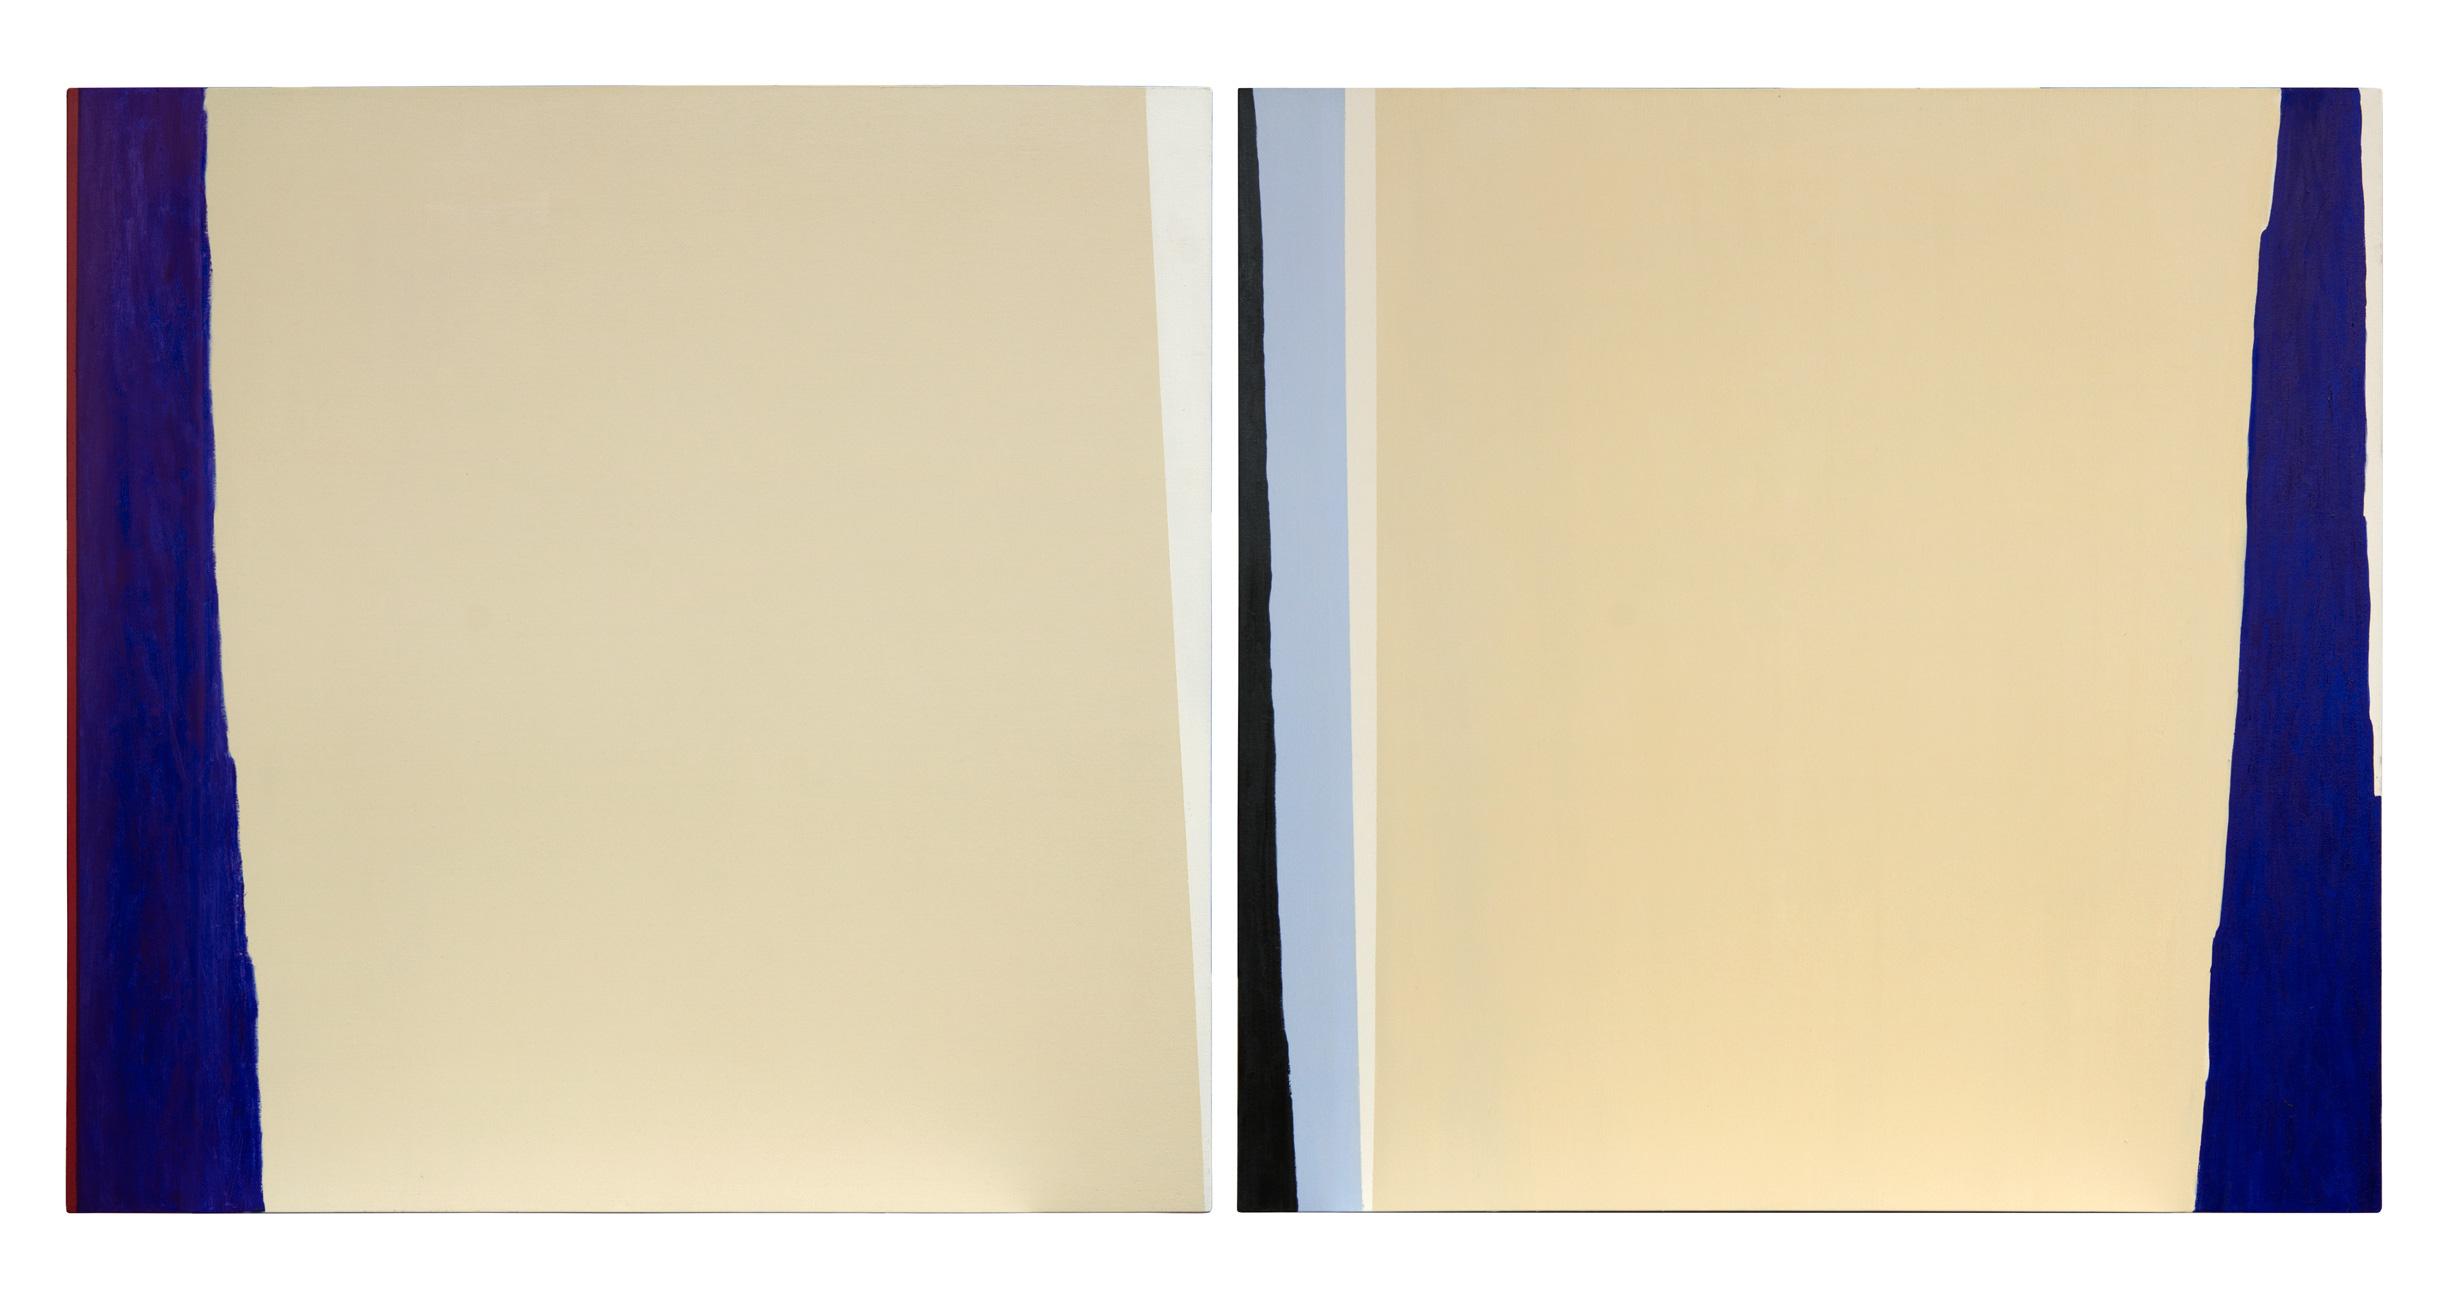 Intervencion 5, oleo sobre lienzo, 100 x 200 cms